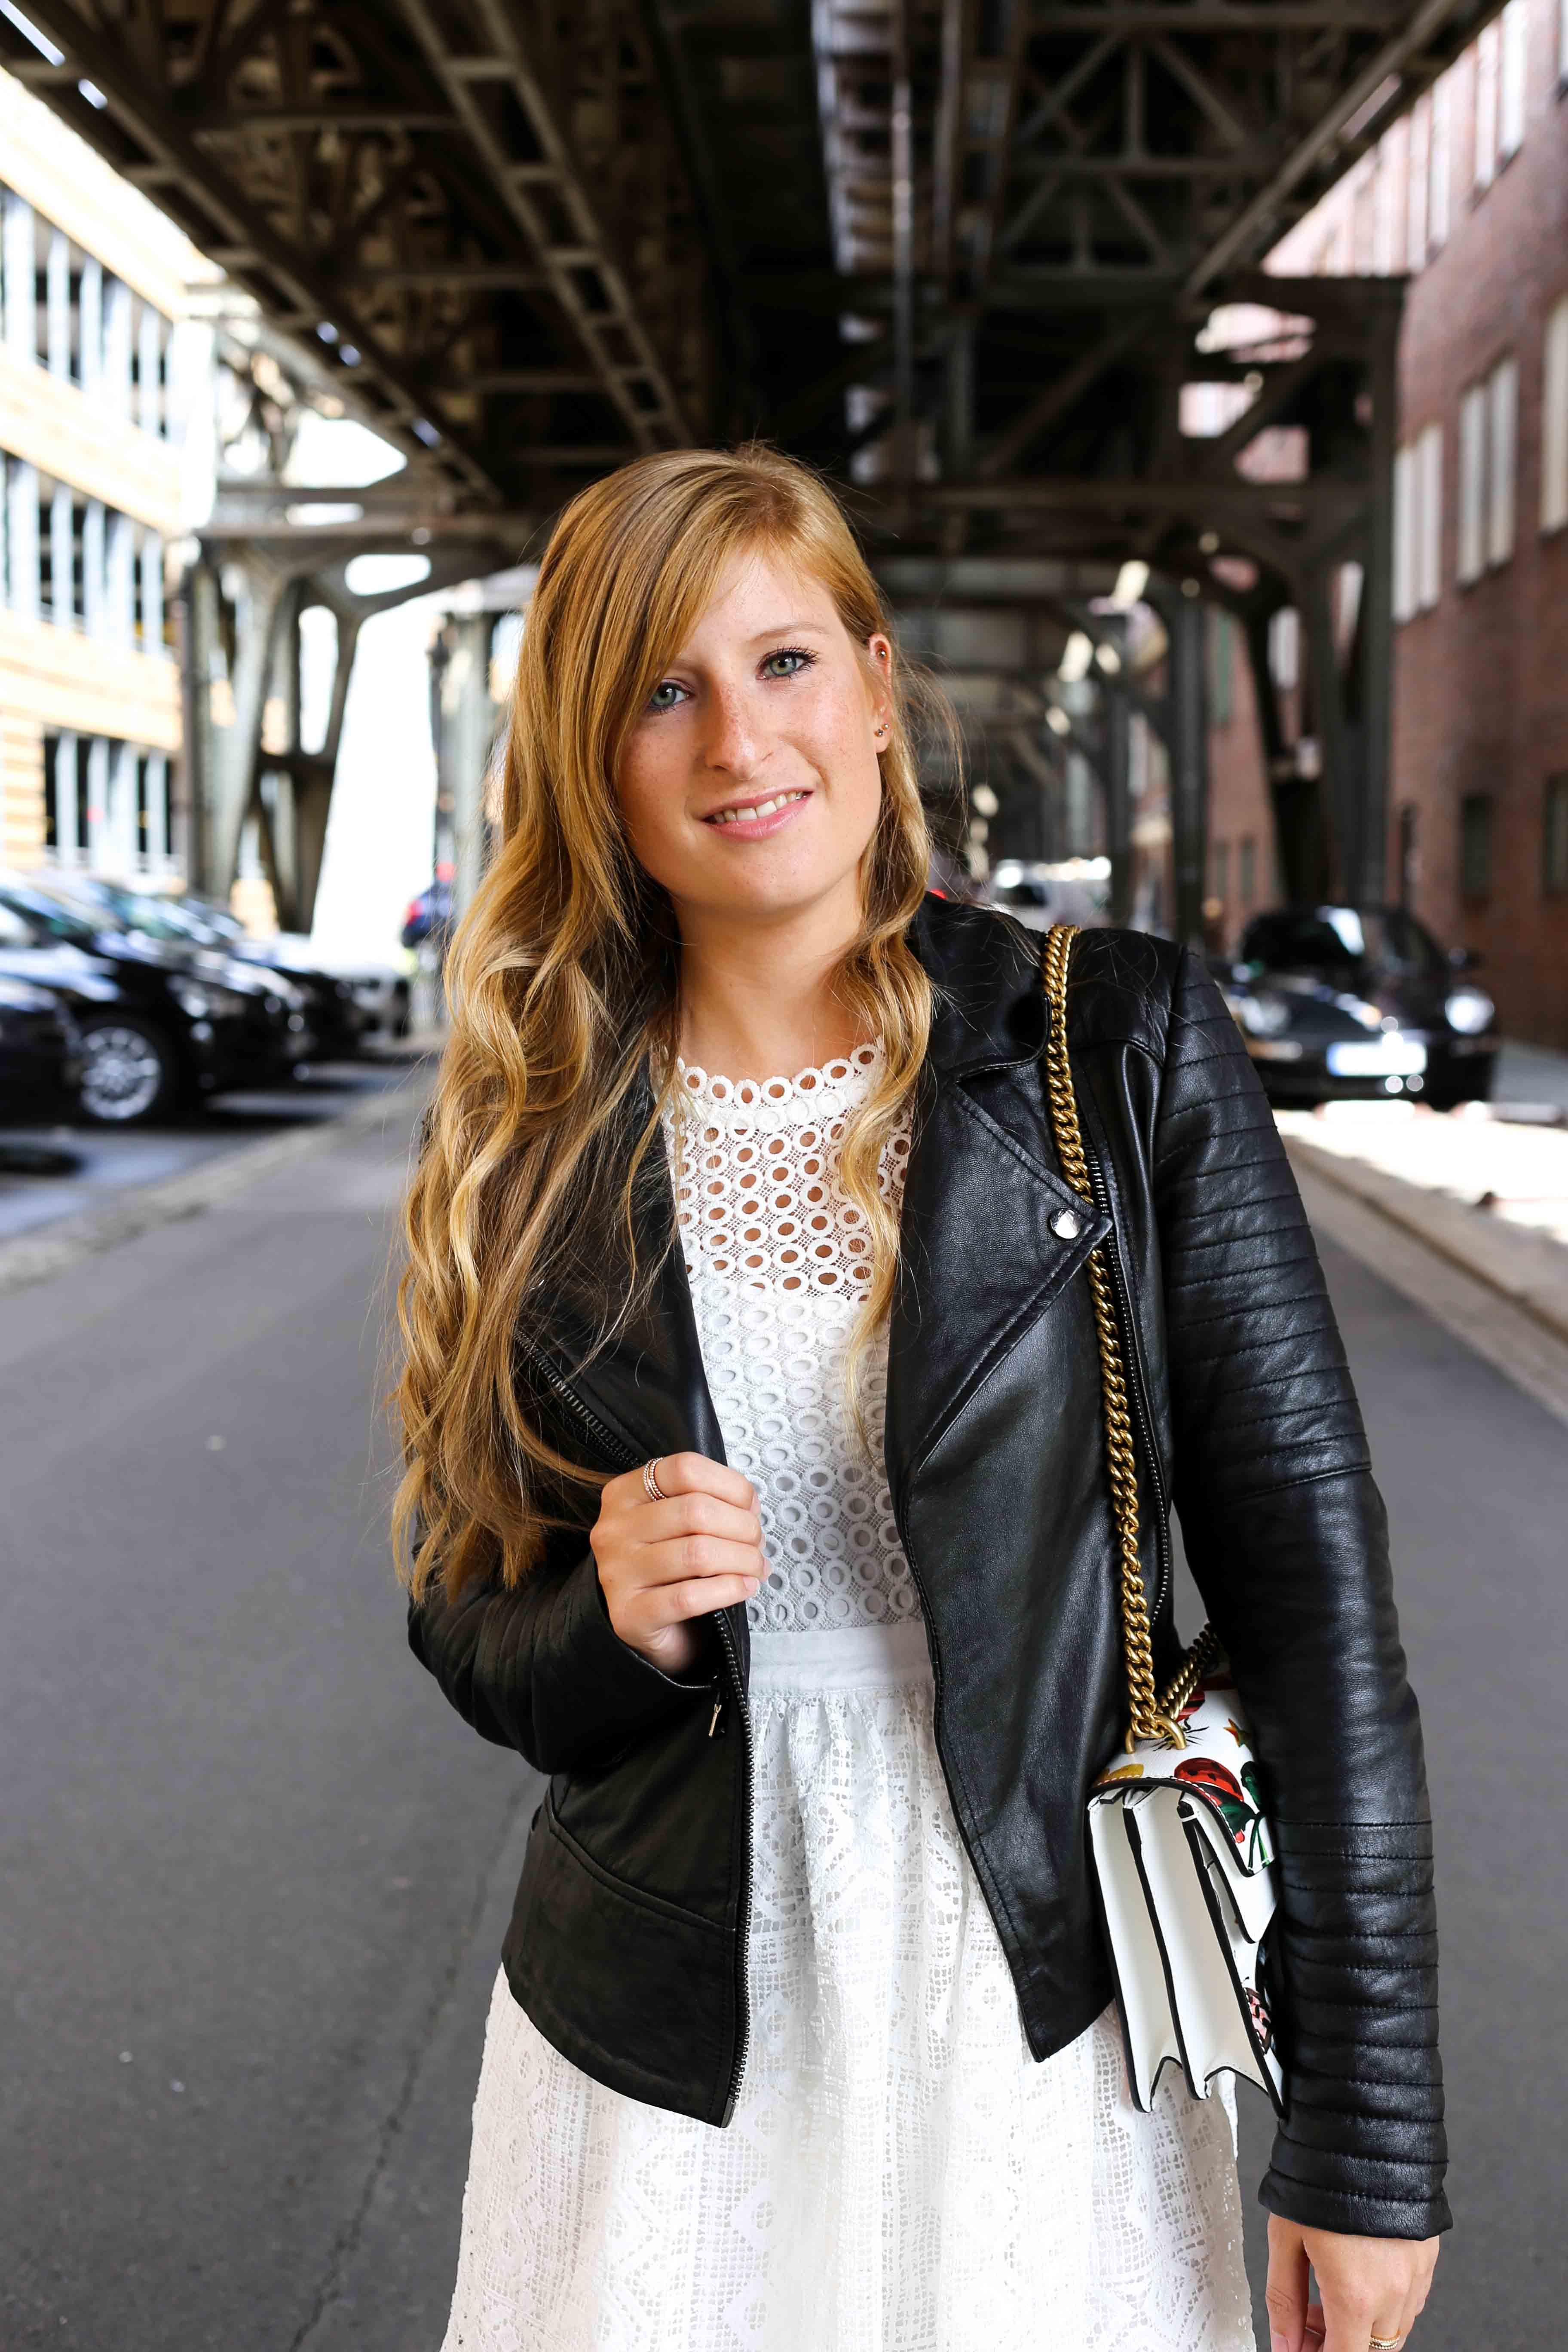 Fashion Week Outfit streetstyle kombinieren Lederjacke Modeblog Deutschland Fashion Blogger OOTD 7